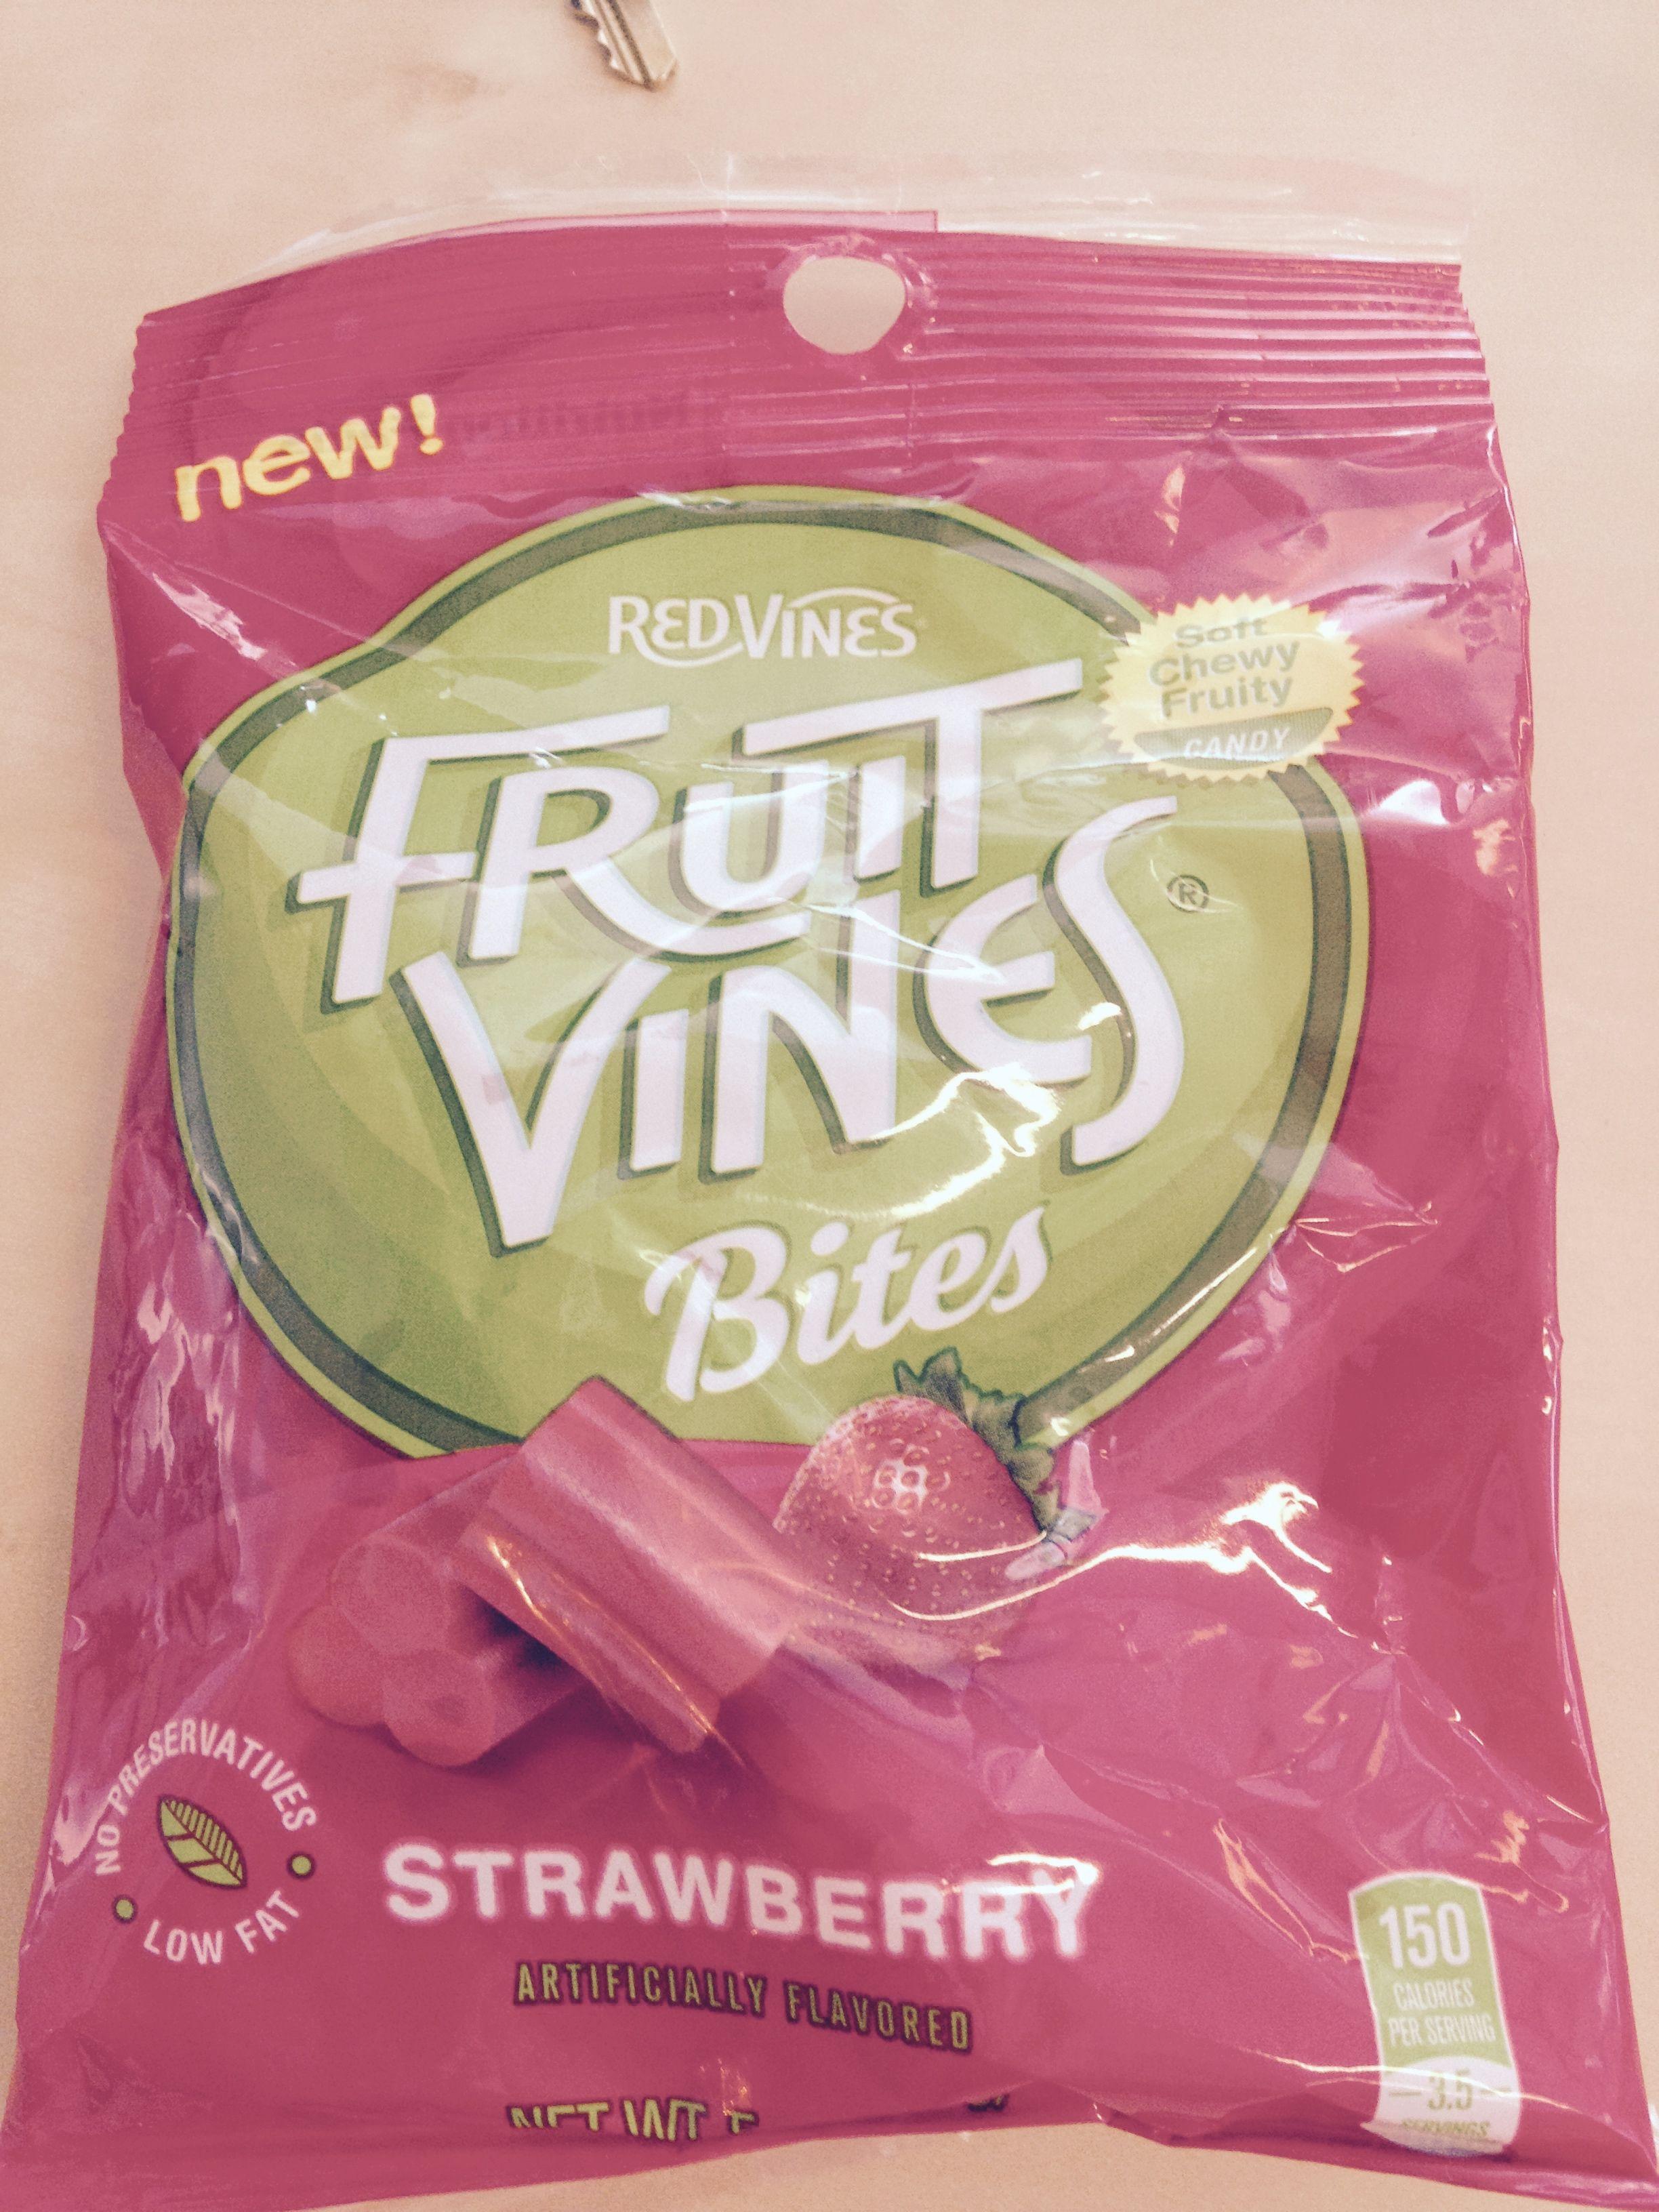 Yummy Strawberry Fruit Vines!! :)  #SweetSide